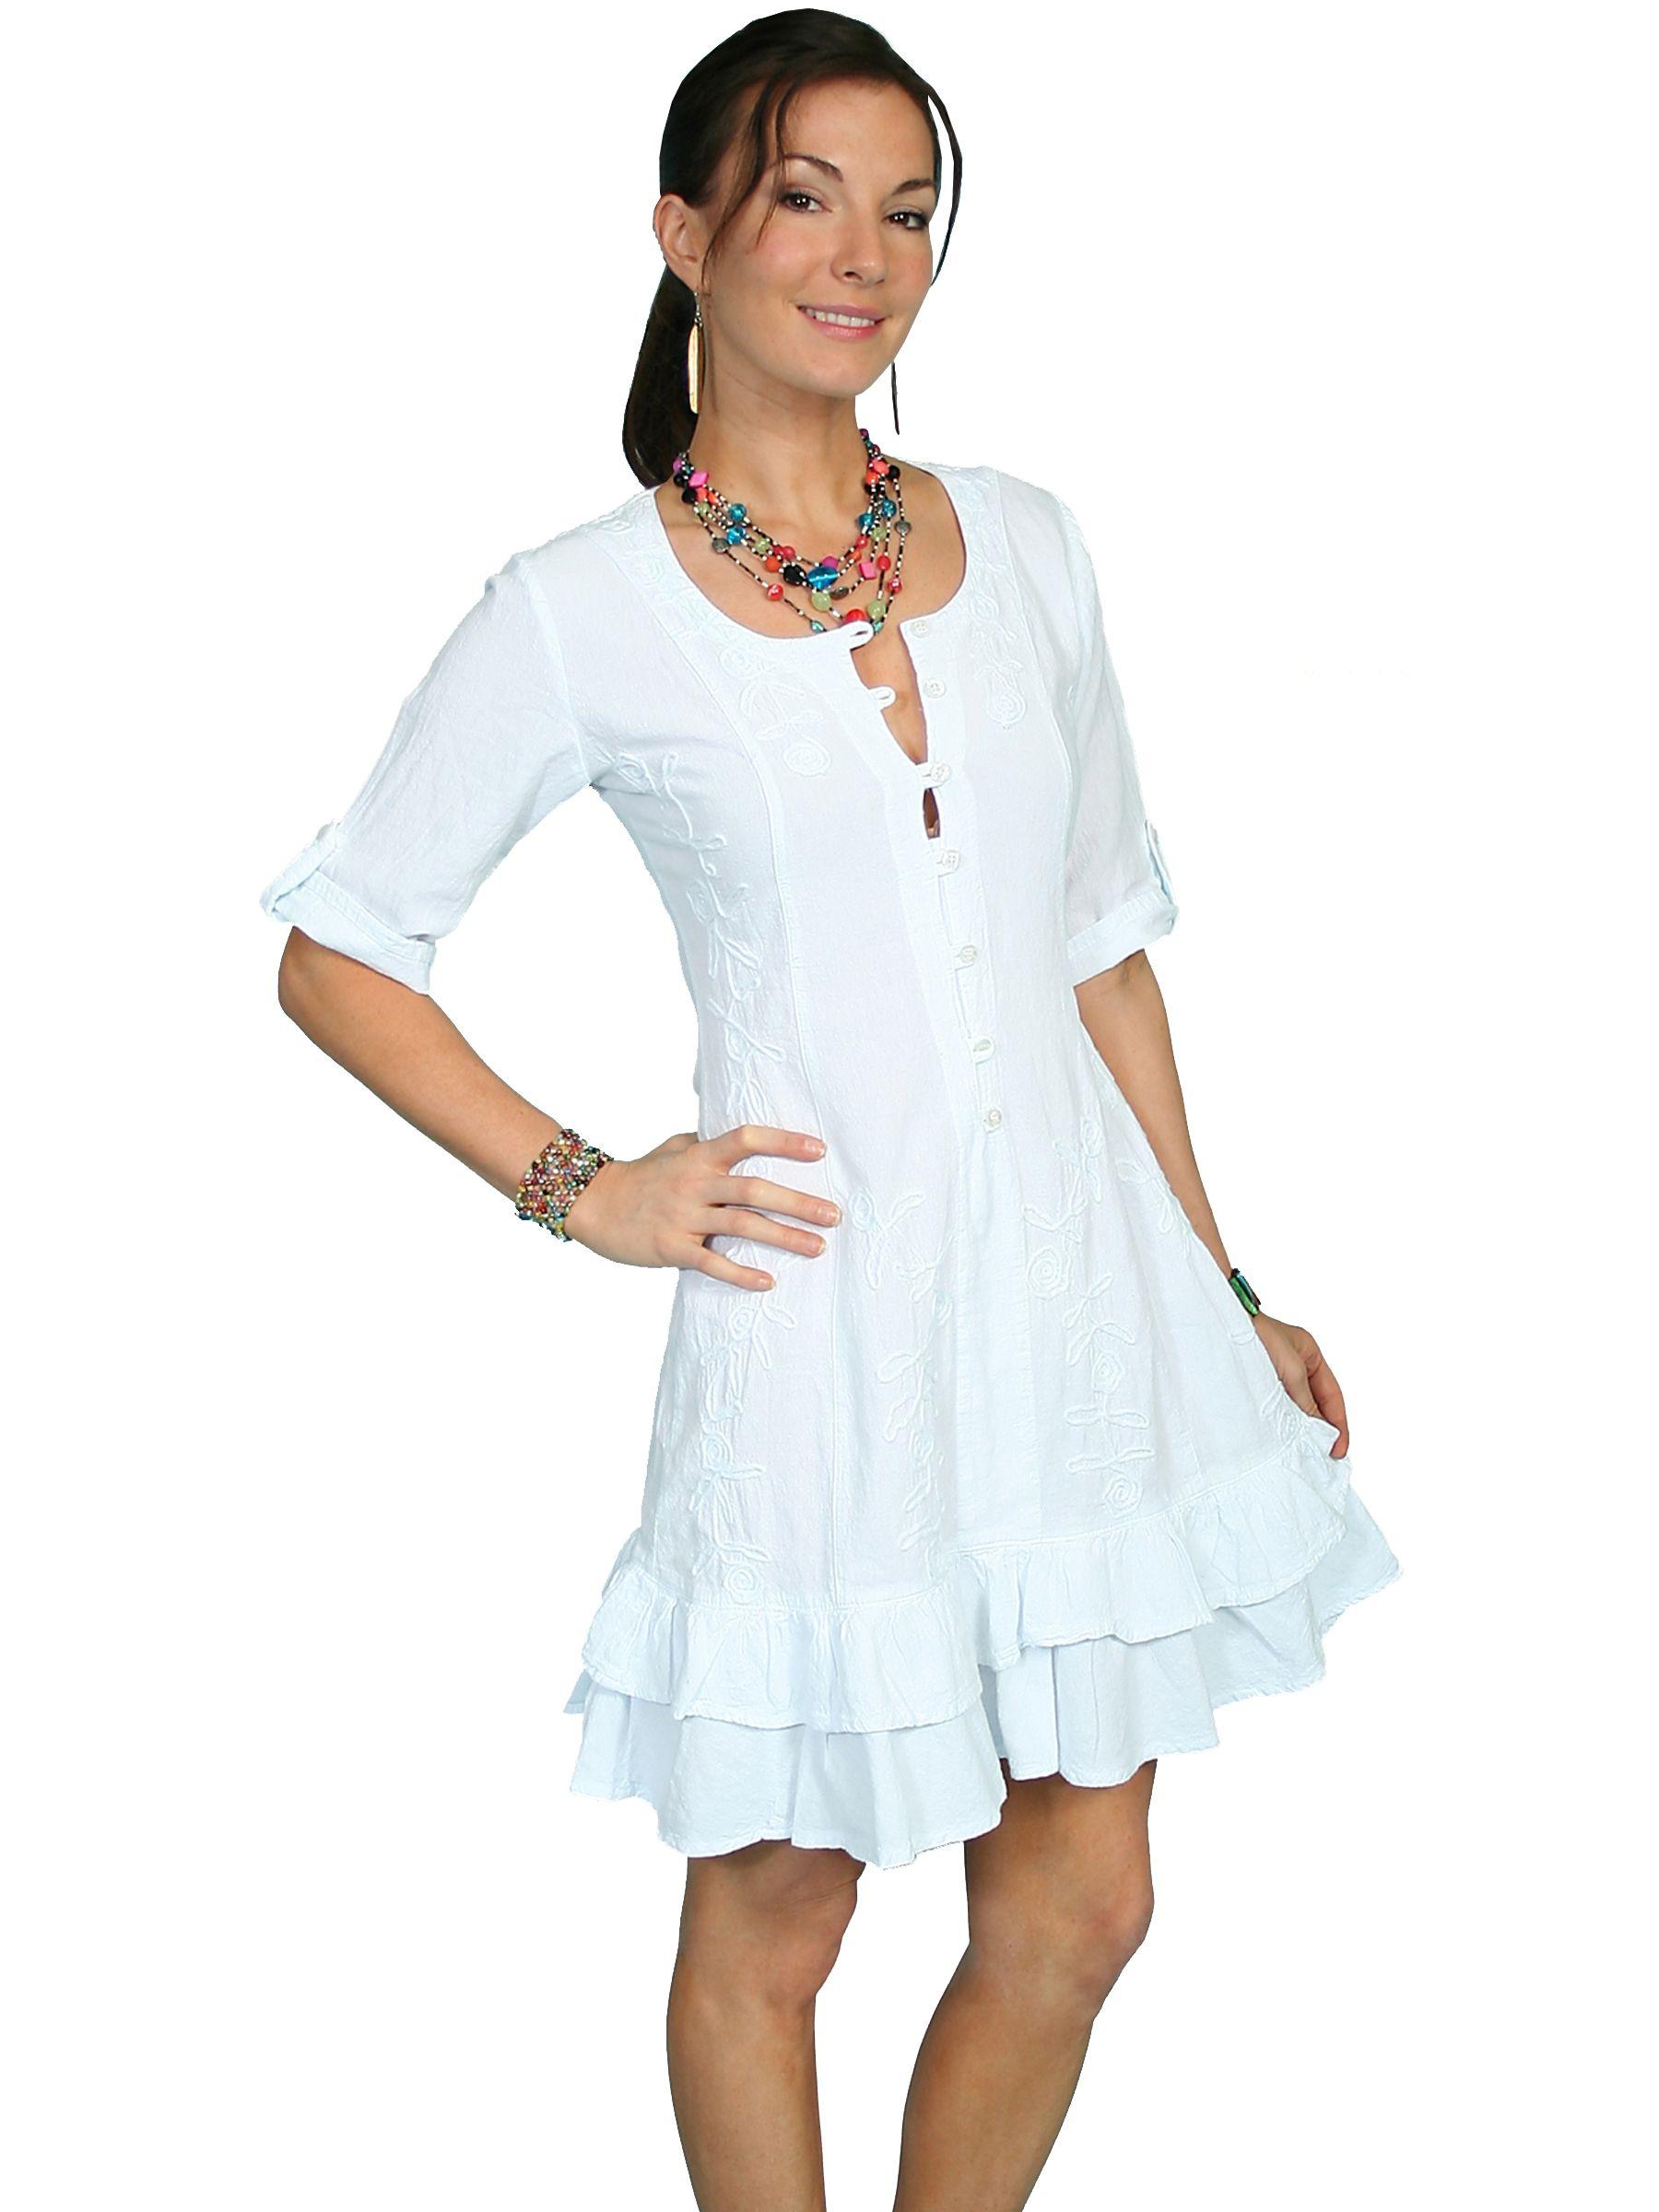 Scully Womens Peruvian Cotton 3 4 Sleeve White Short Dress 34dbc3a033